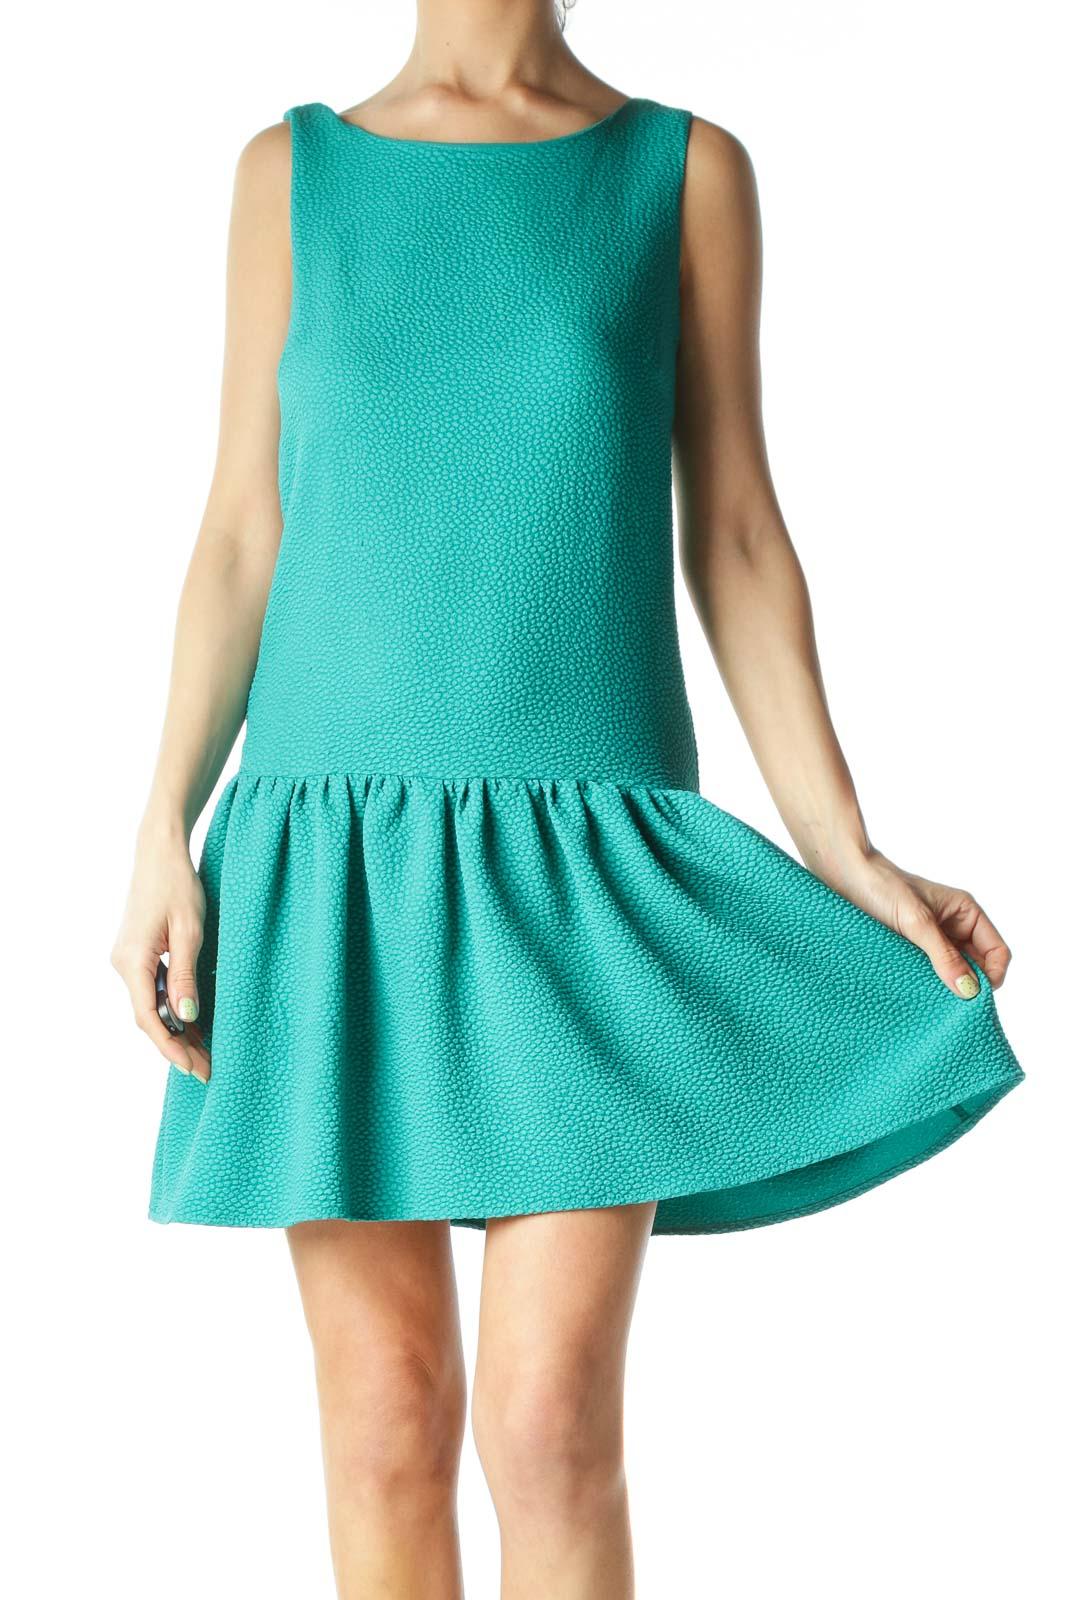 Green Textured Flared-Bottom Sleeveless Day Dress Front